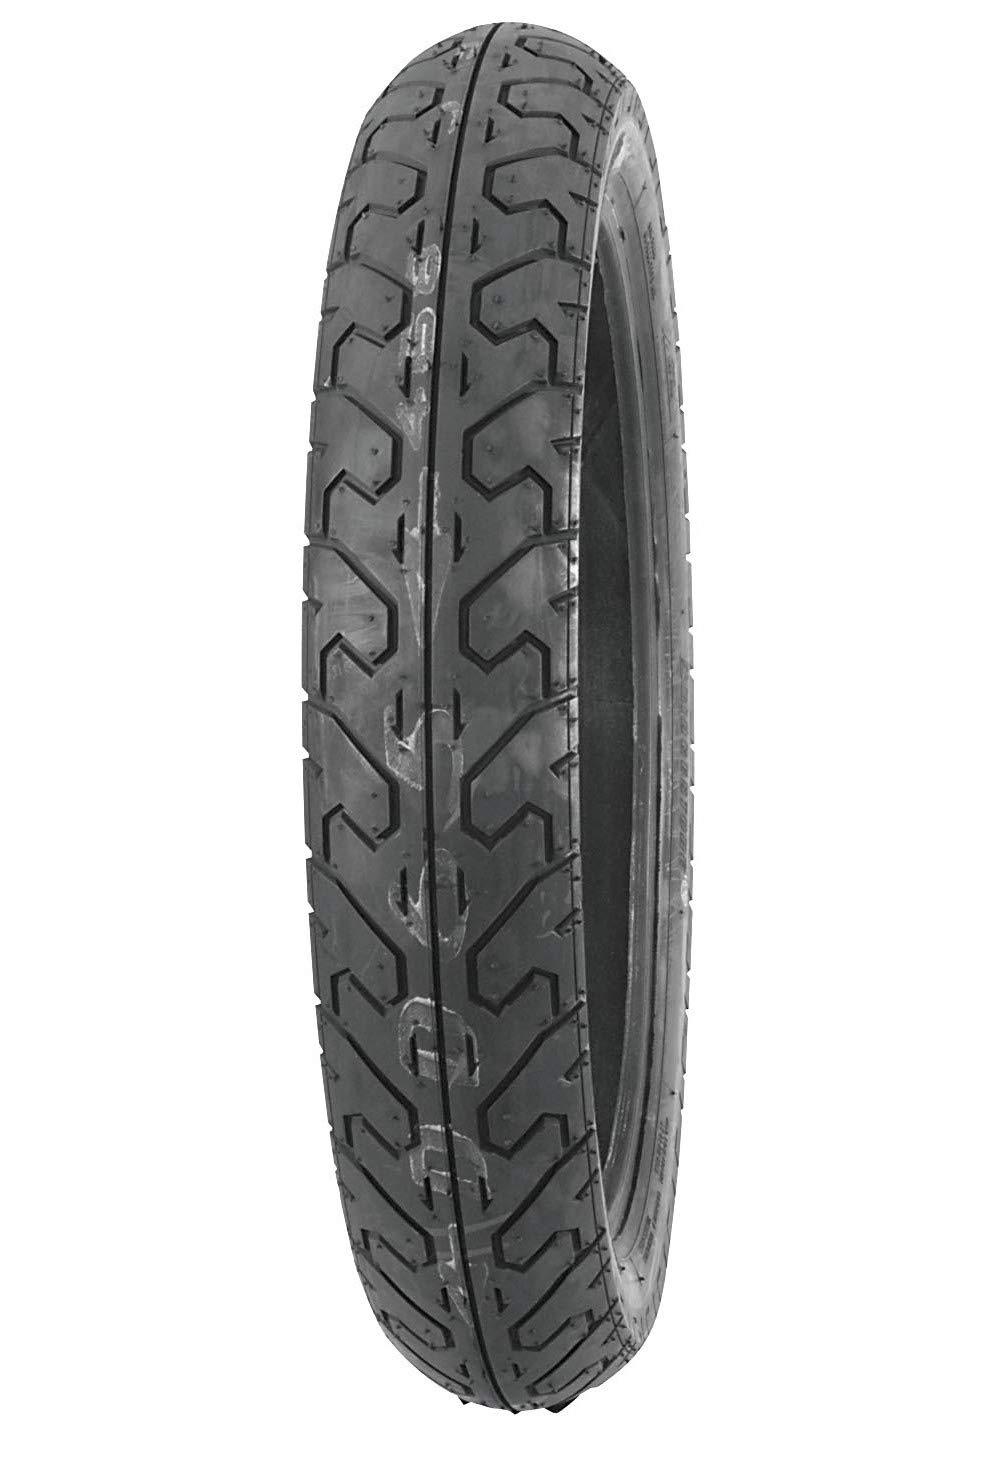 Bridgestone Spitfire S11F Sport/Touring Front Motorcycle Tire 130/90-16 -Parent tr-300128